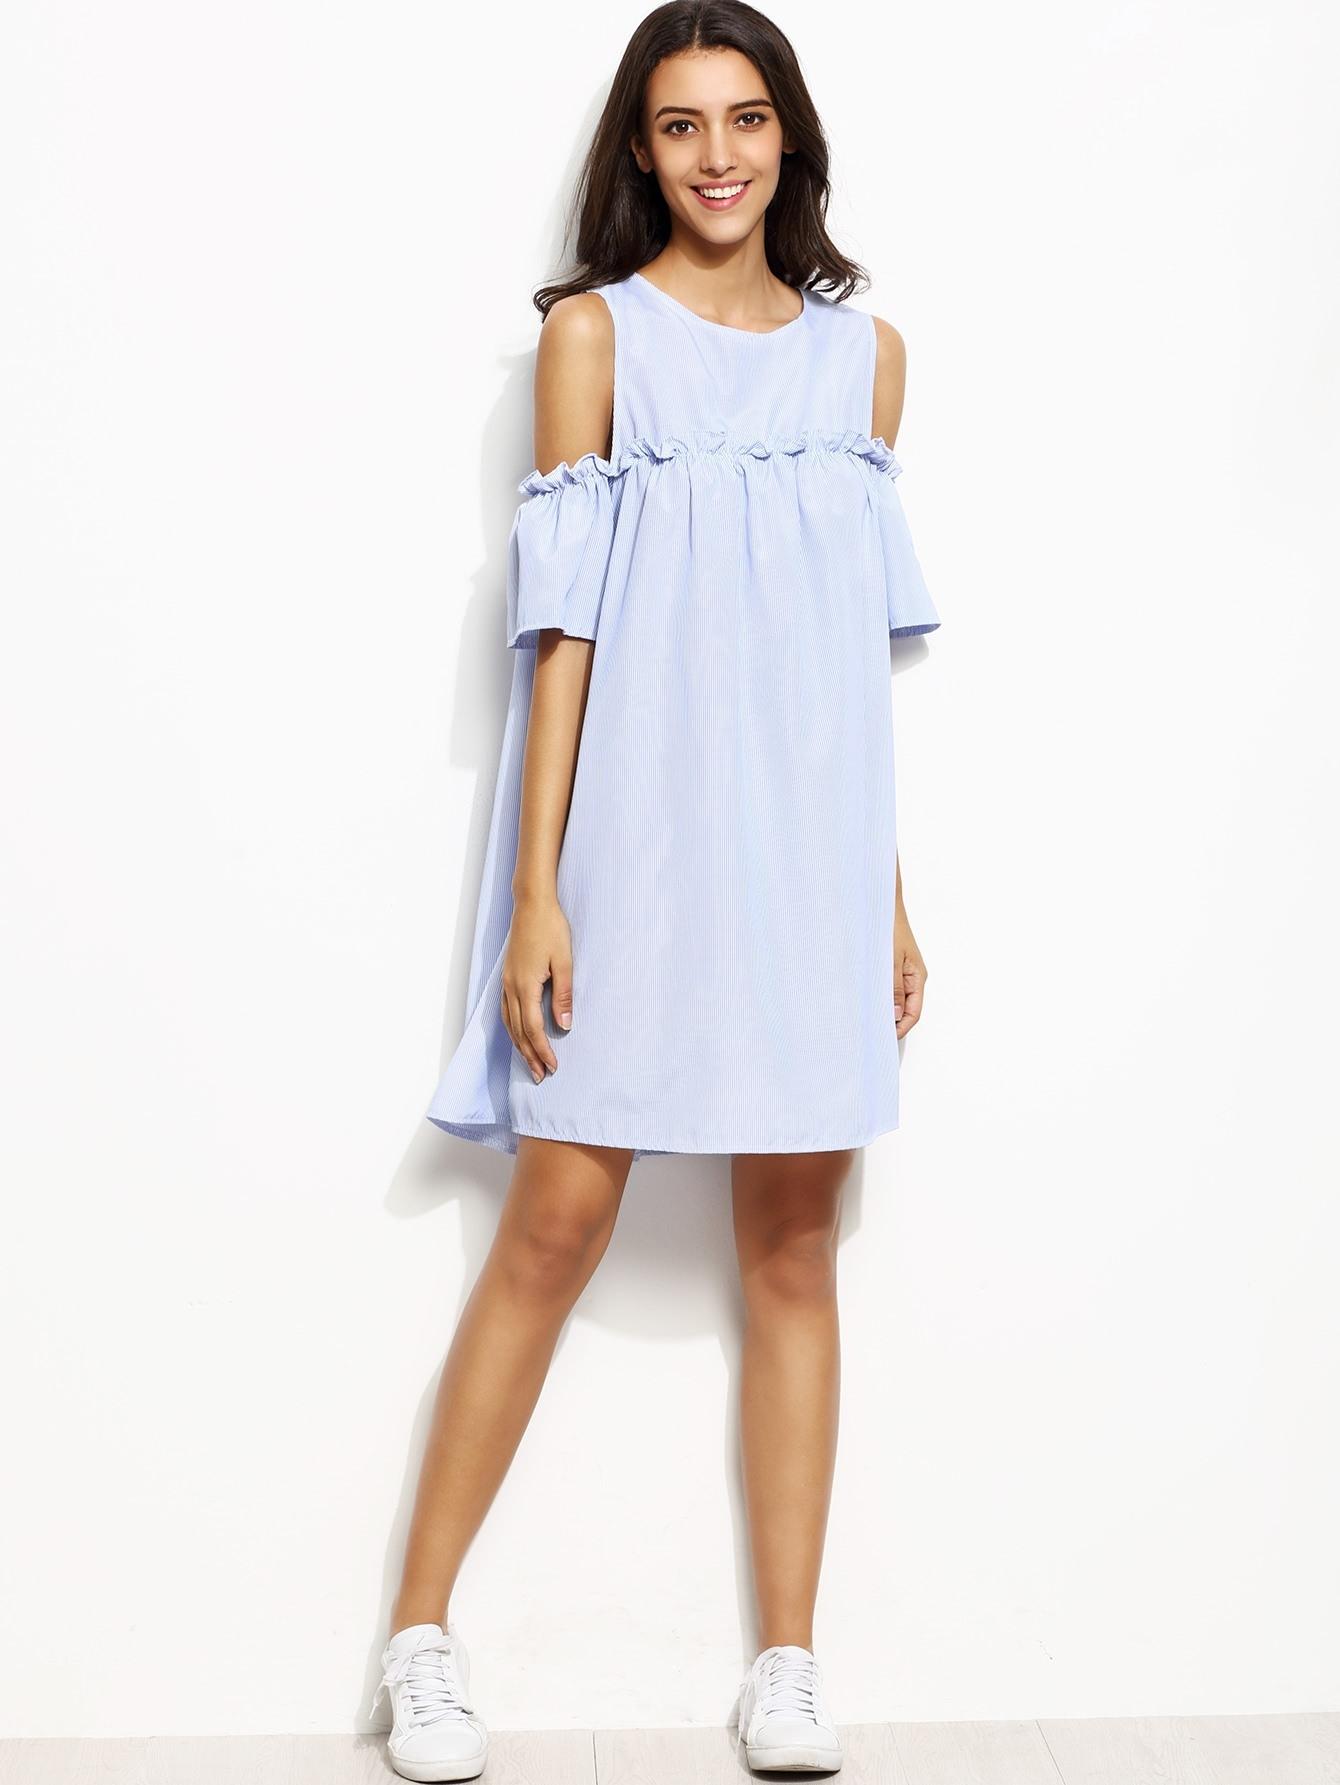 Abend Luxus Kleid Blau Kurz Stylish13 Luxus Kleid Blau Kurz Design